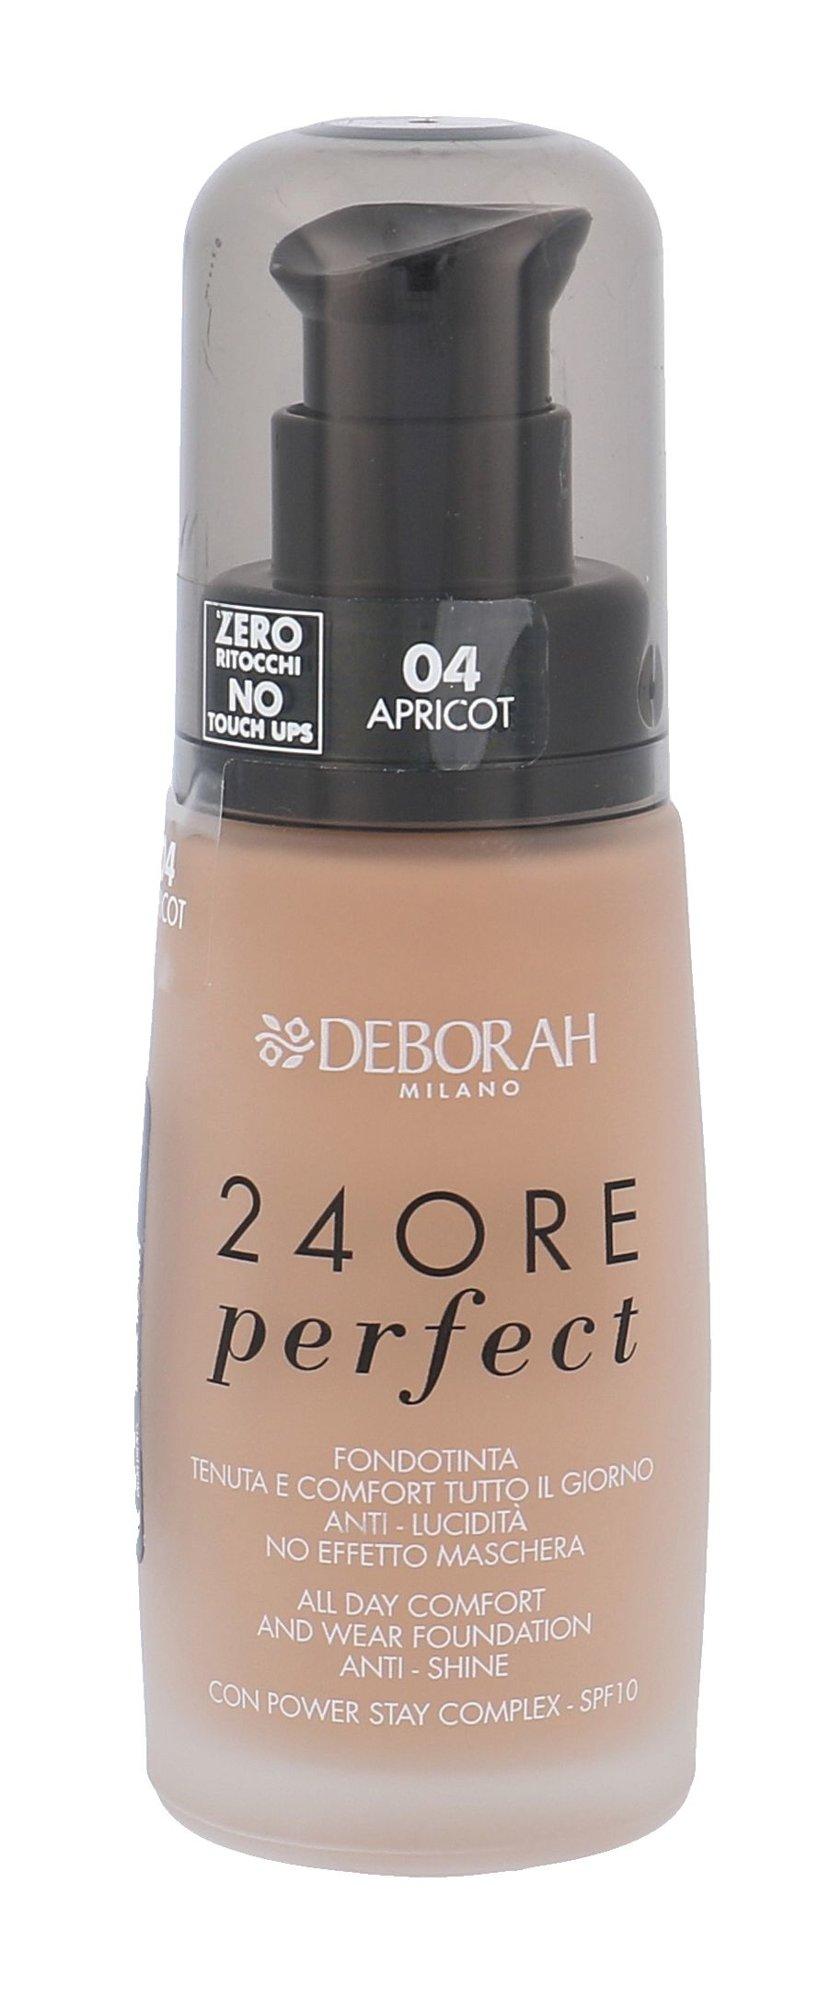 Deborah Milano 24Ore Cosmetic 30ml 04 Apricot